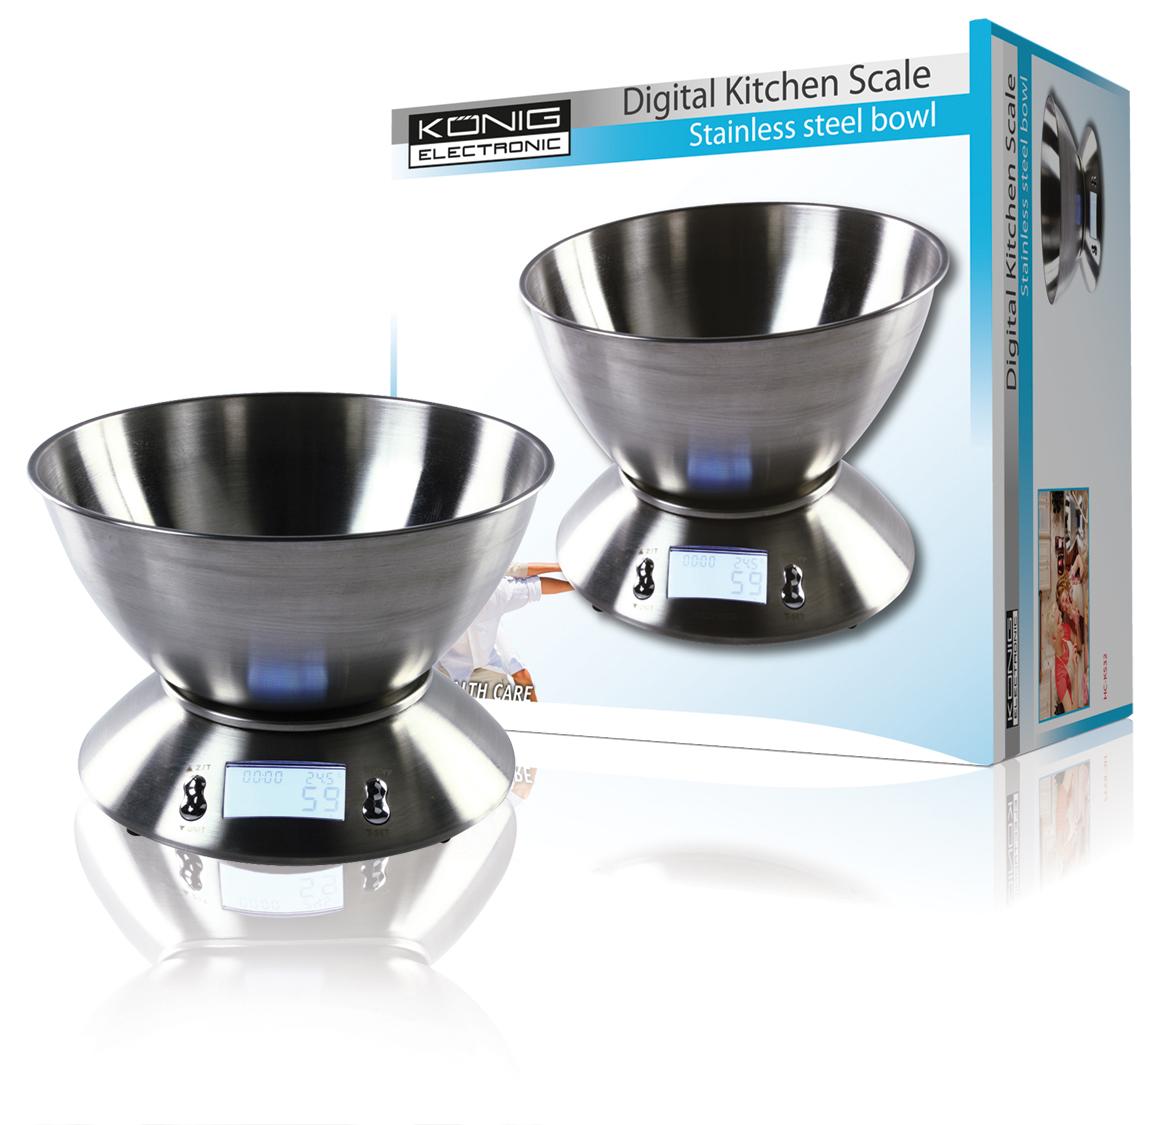 B scula de cocina digital con bol de acero inoxidable - Bascula de cocina barata ...